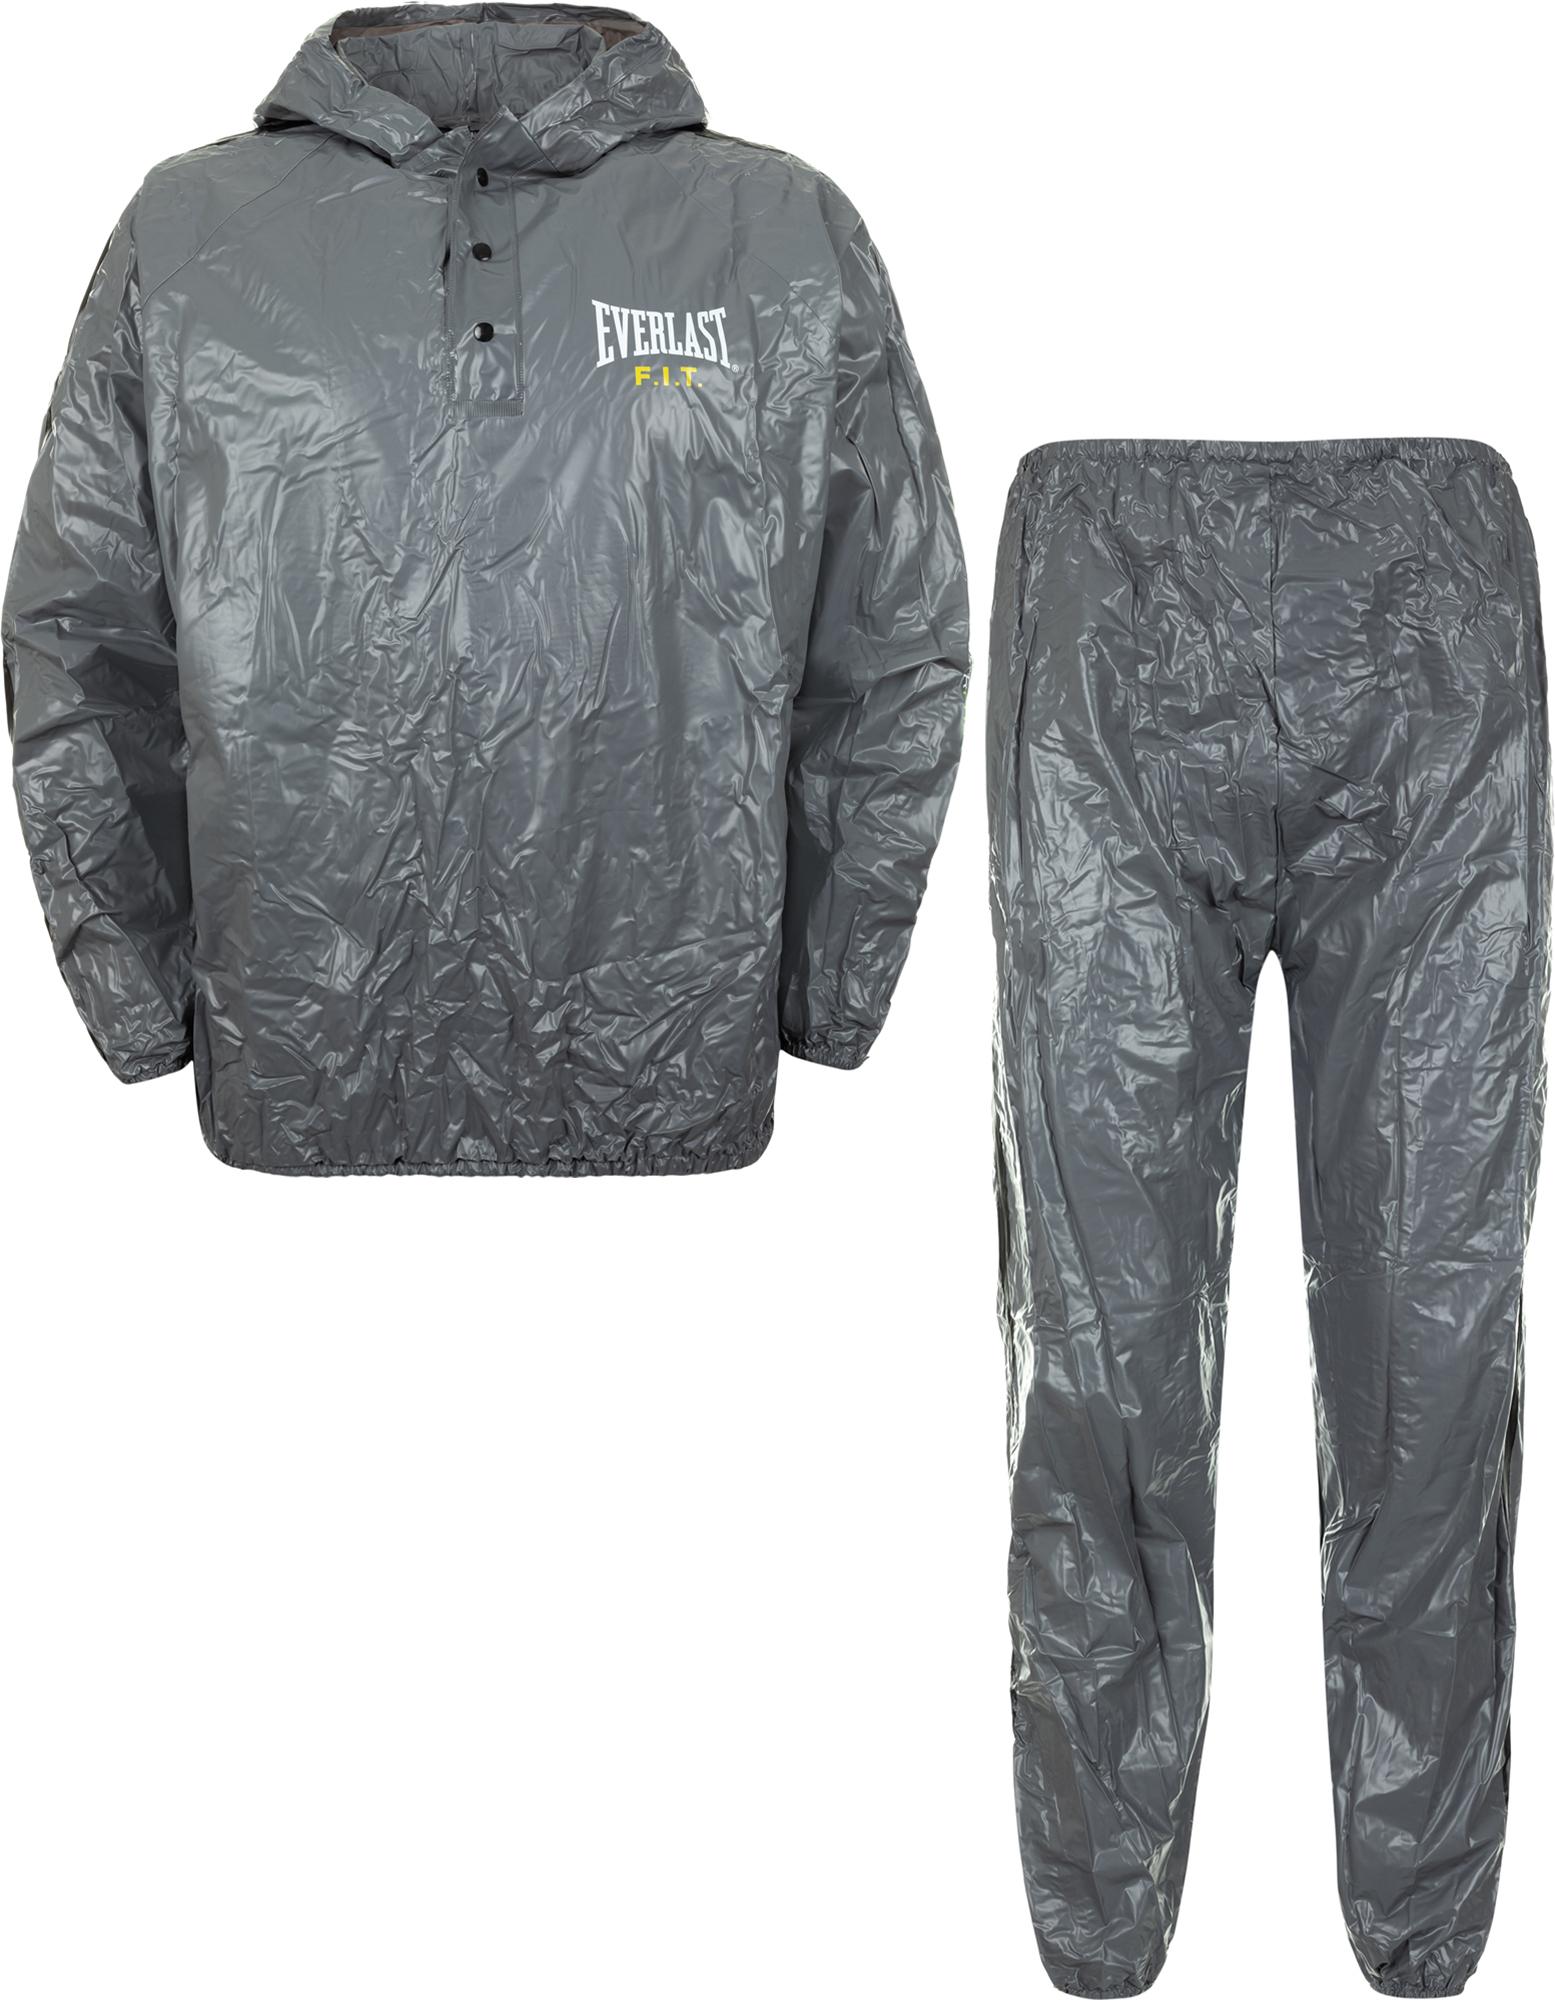 Everlast Костюм сауна с капюшоном Everlast, размер XL/XXL костюм демисезонный norfin pro light blue 05 xxl